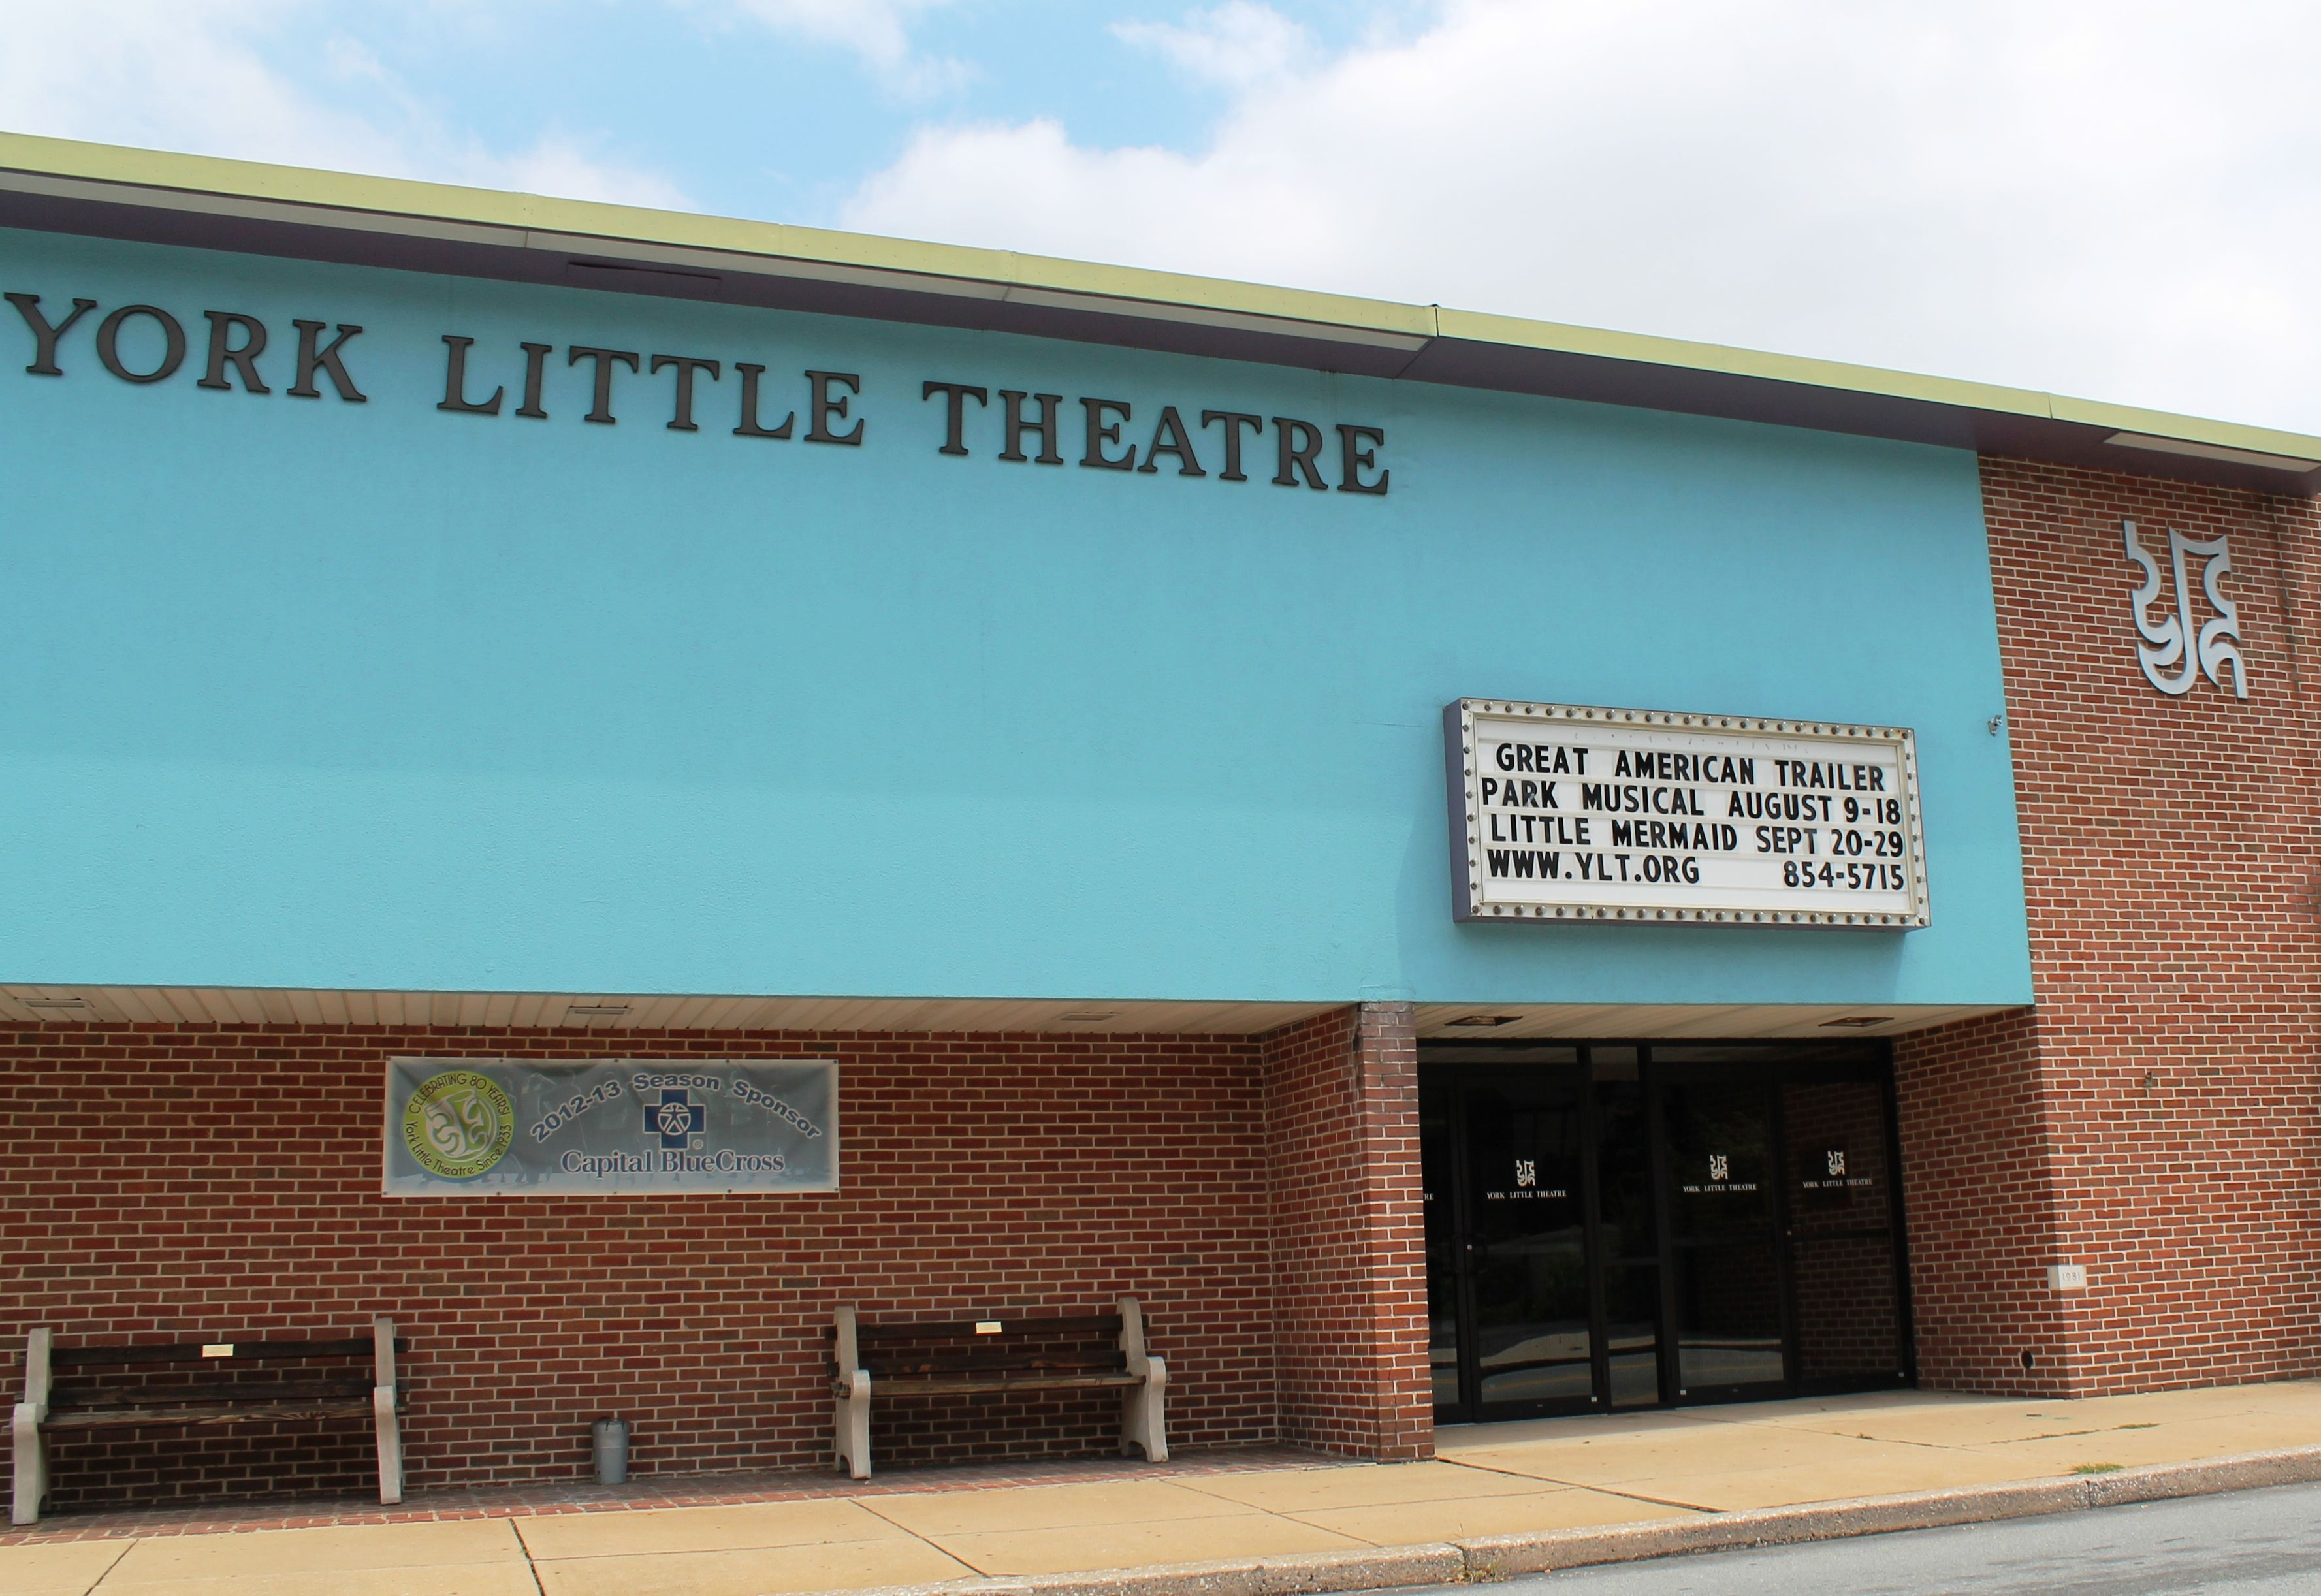 York Little Theatre 27 S Belmont St York Pa In 2019 York Pa